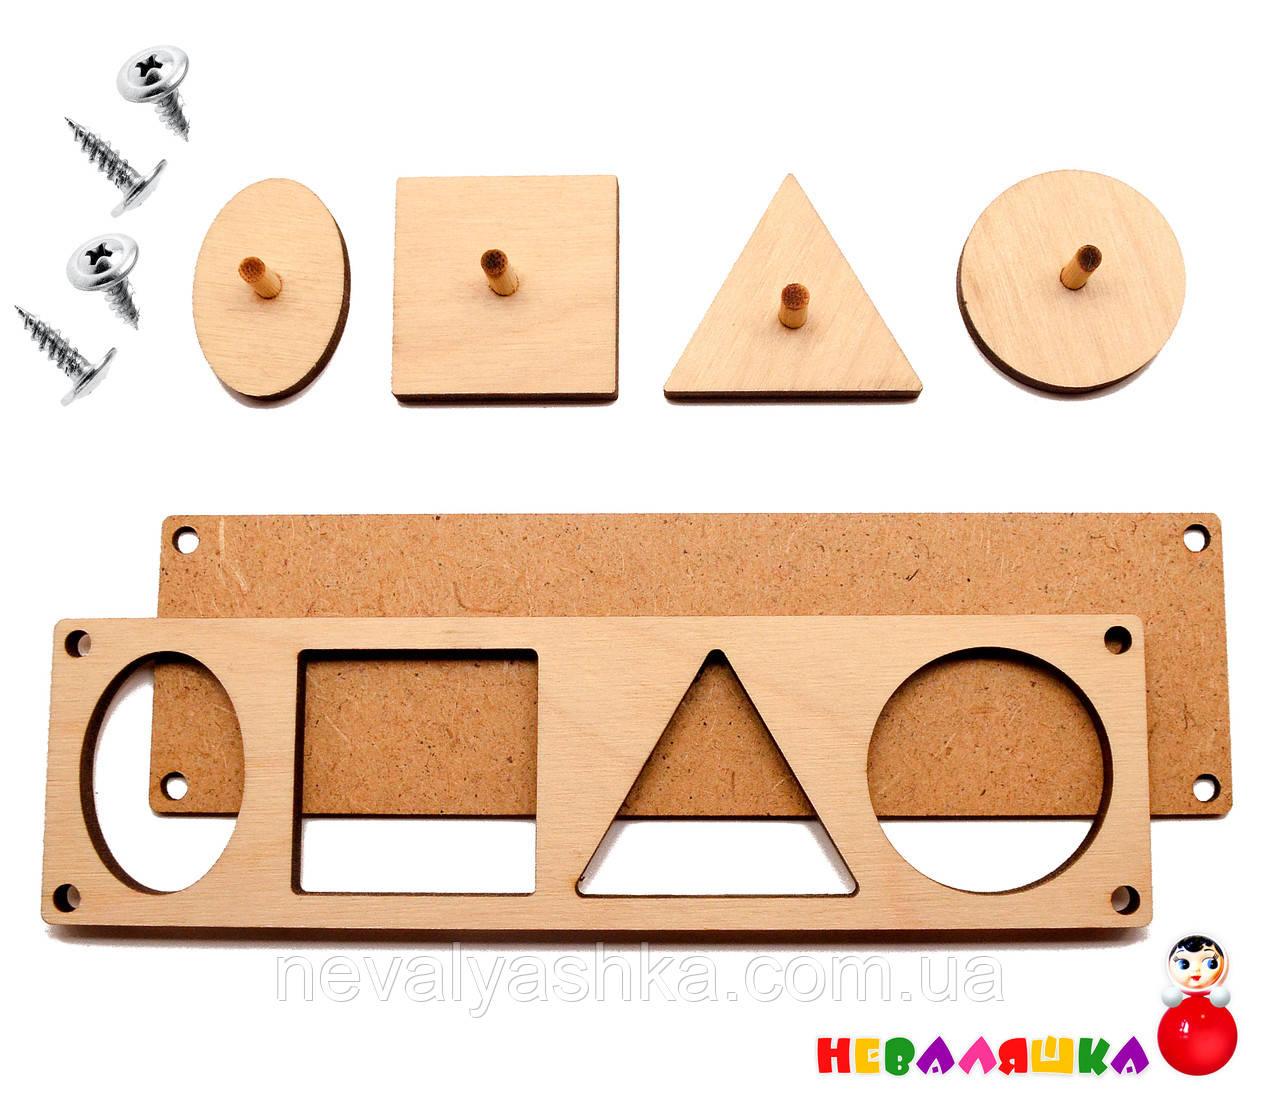 Заготовка Рамка Вкладыш 4 Геометрические Фигуры в Ряд для бизиборда Дерев'яні вкладиши для бізіборда